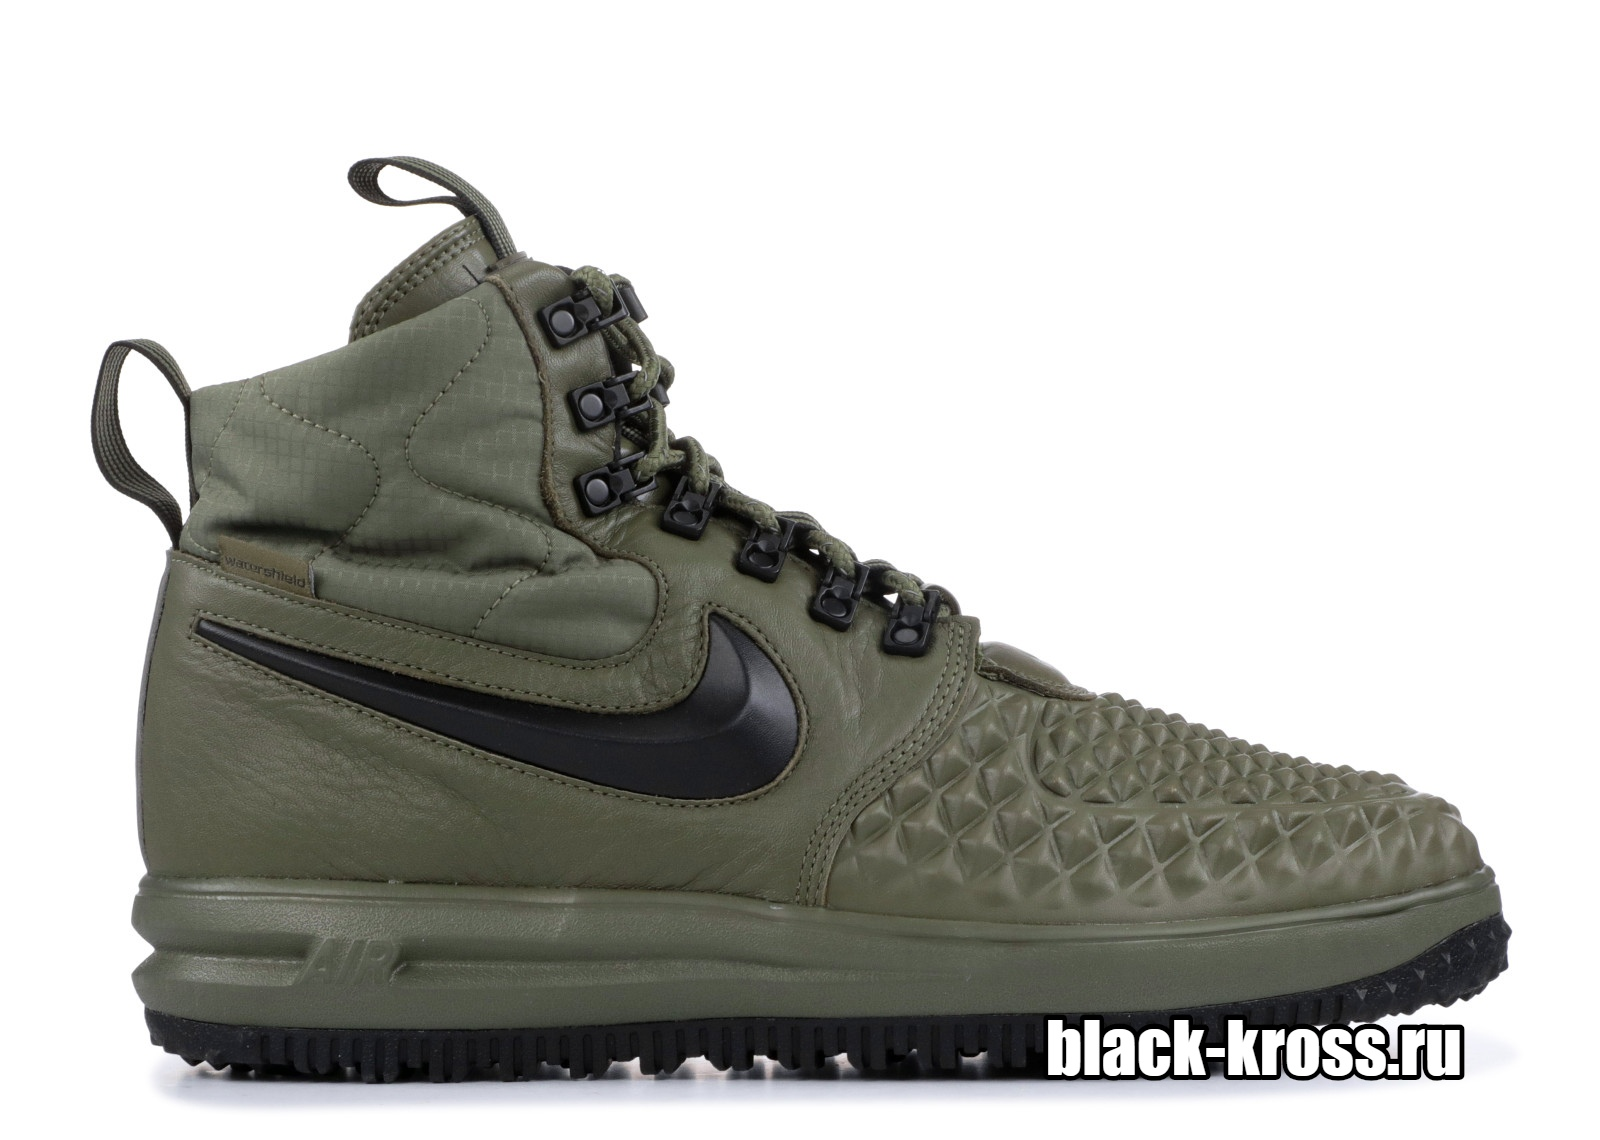 Nike Lunar Force 1 Duckboot Olive Green (41-45)